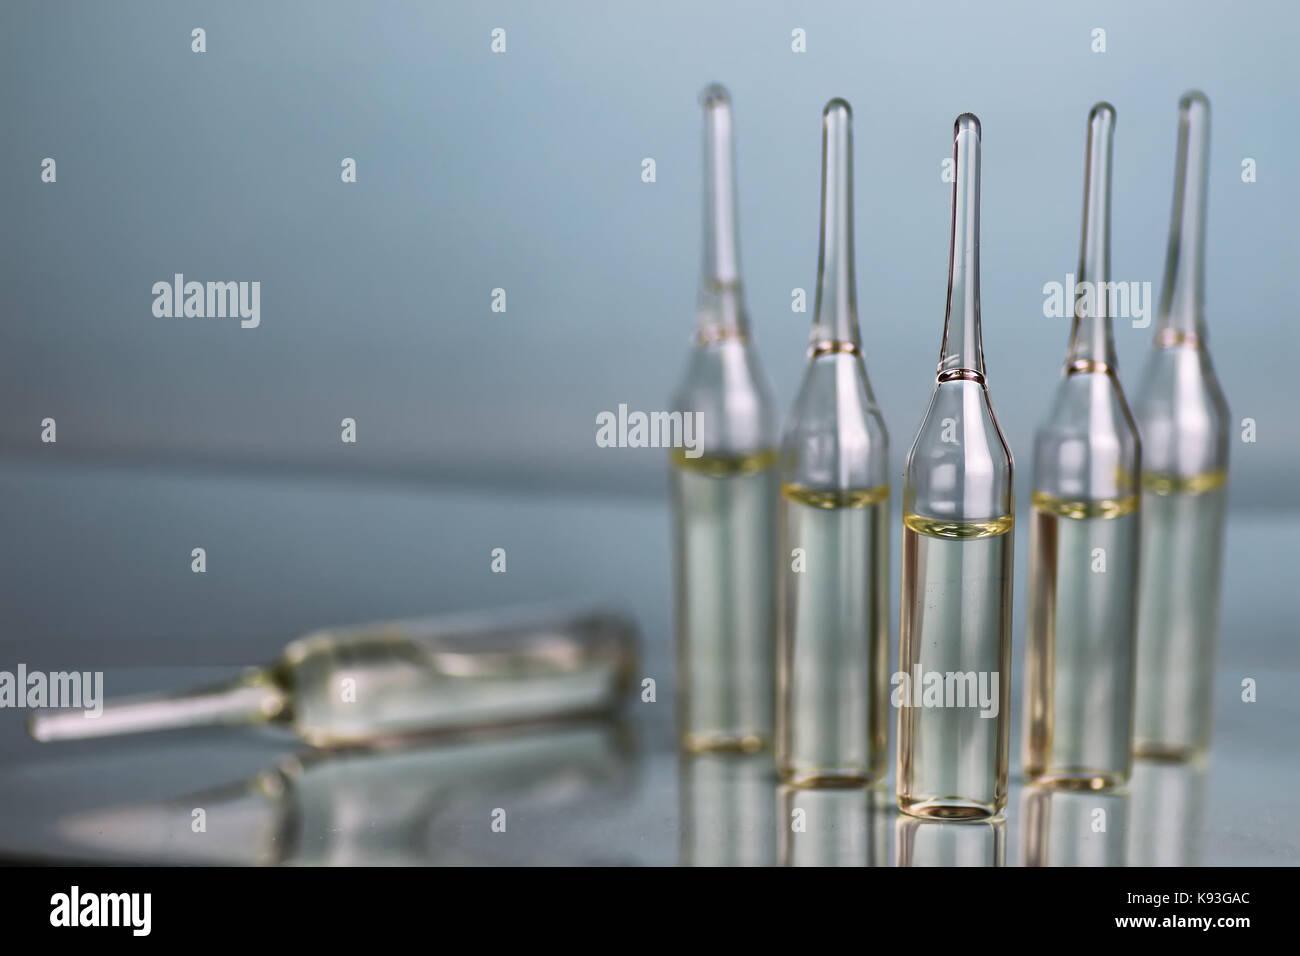 transparent vials of medicine - Stock Image